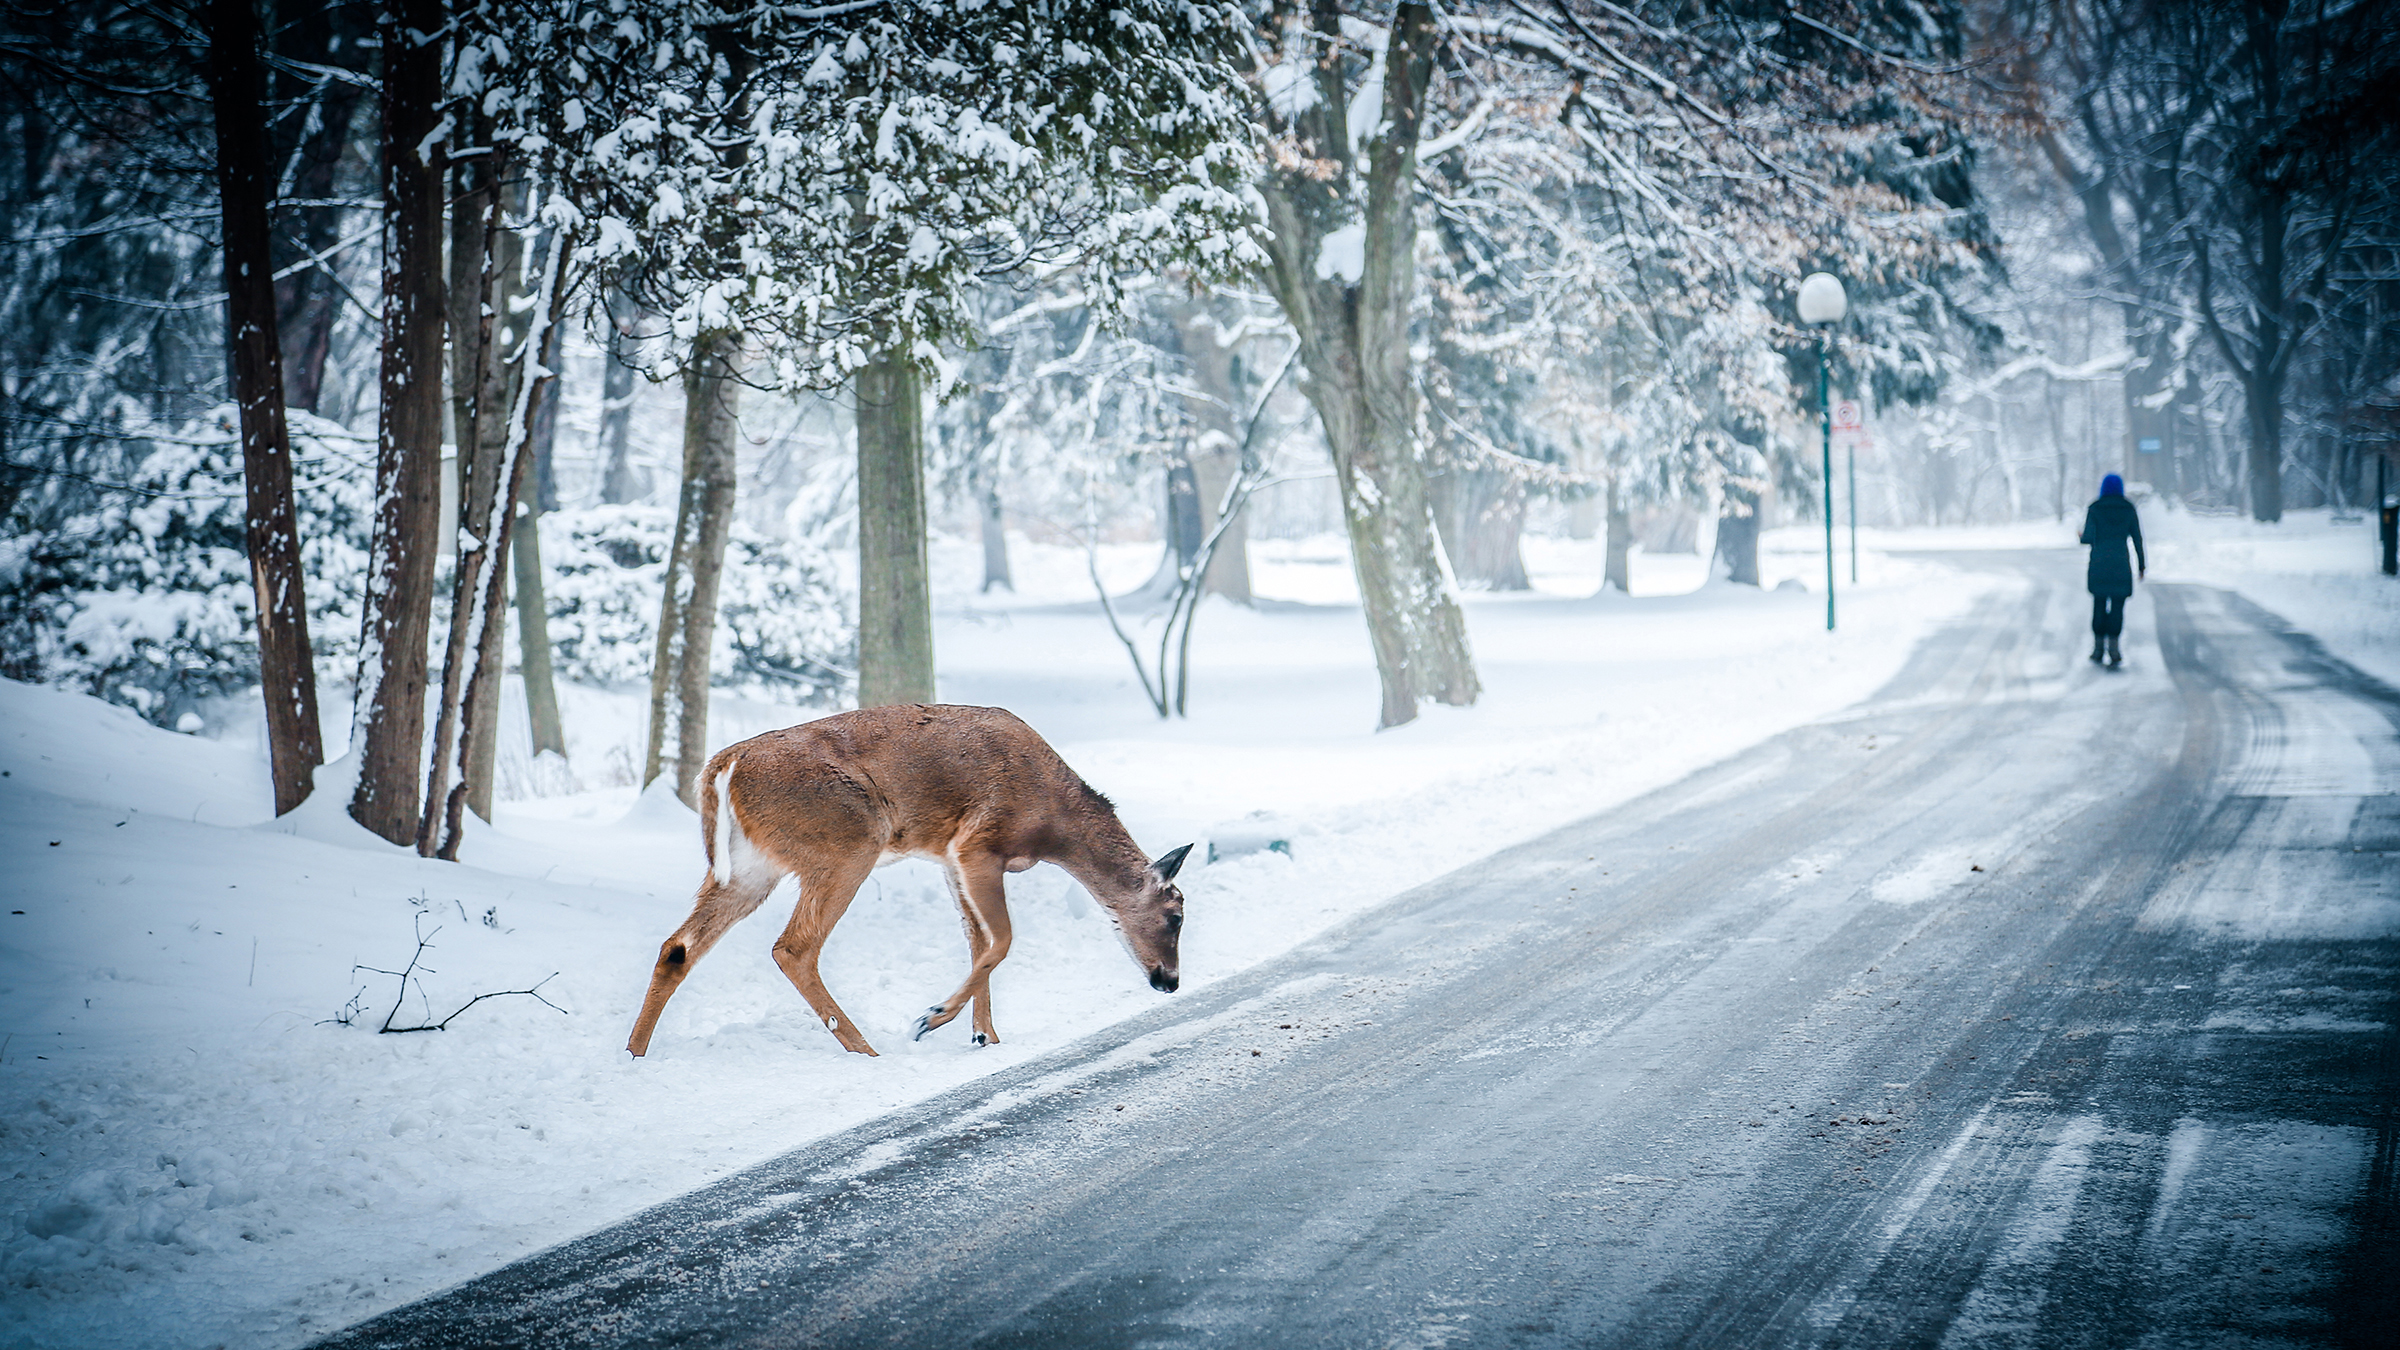 75+] Wallpaper Desktop Winter Scenes on WallpaperSafari